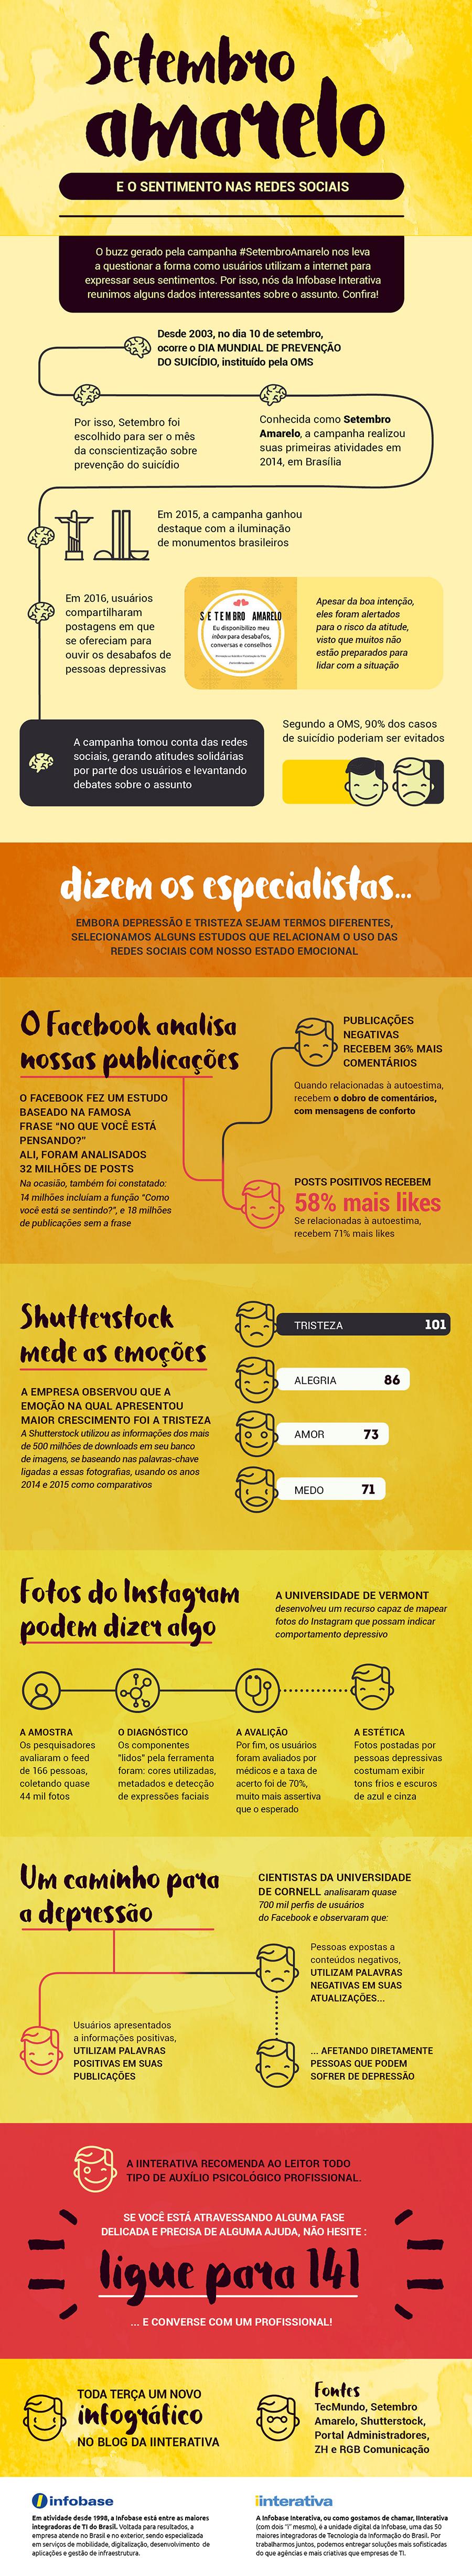 infografico-setembro-amarelo